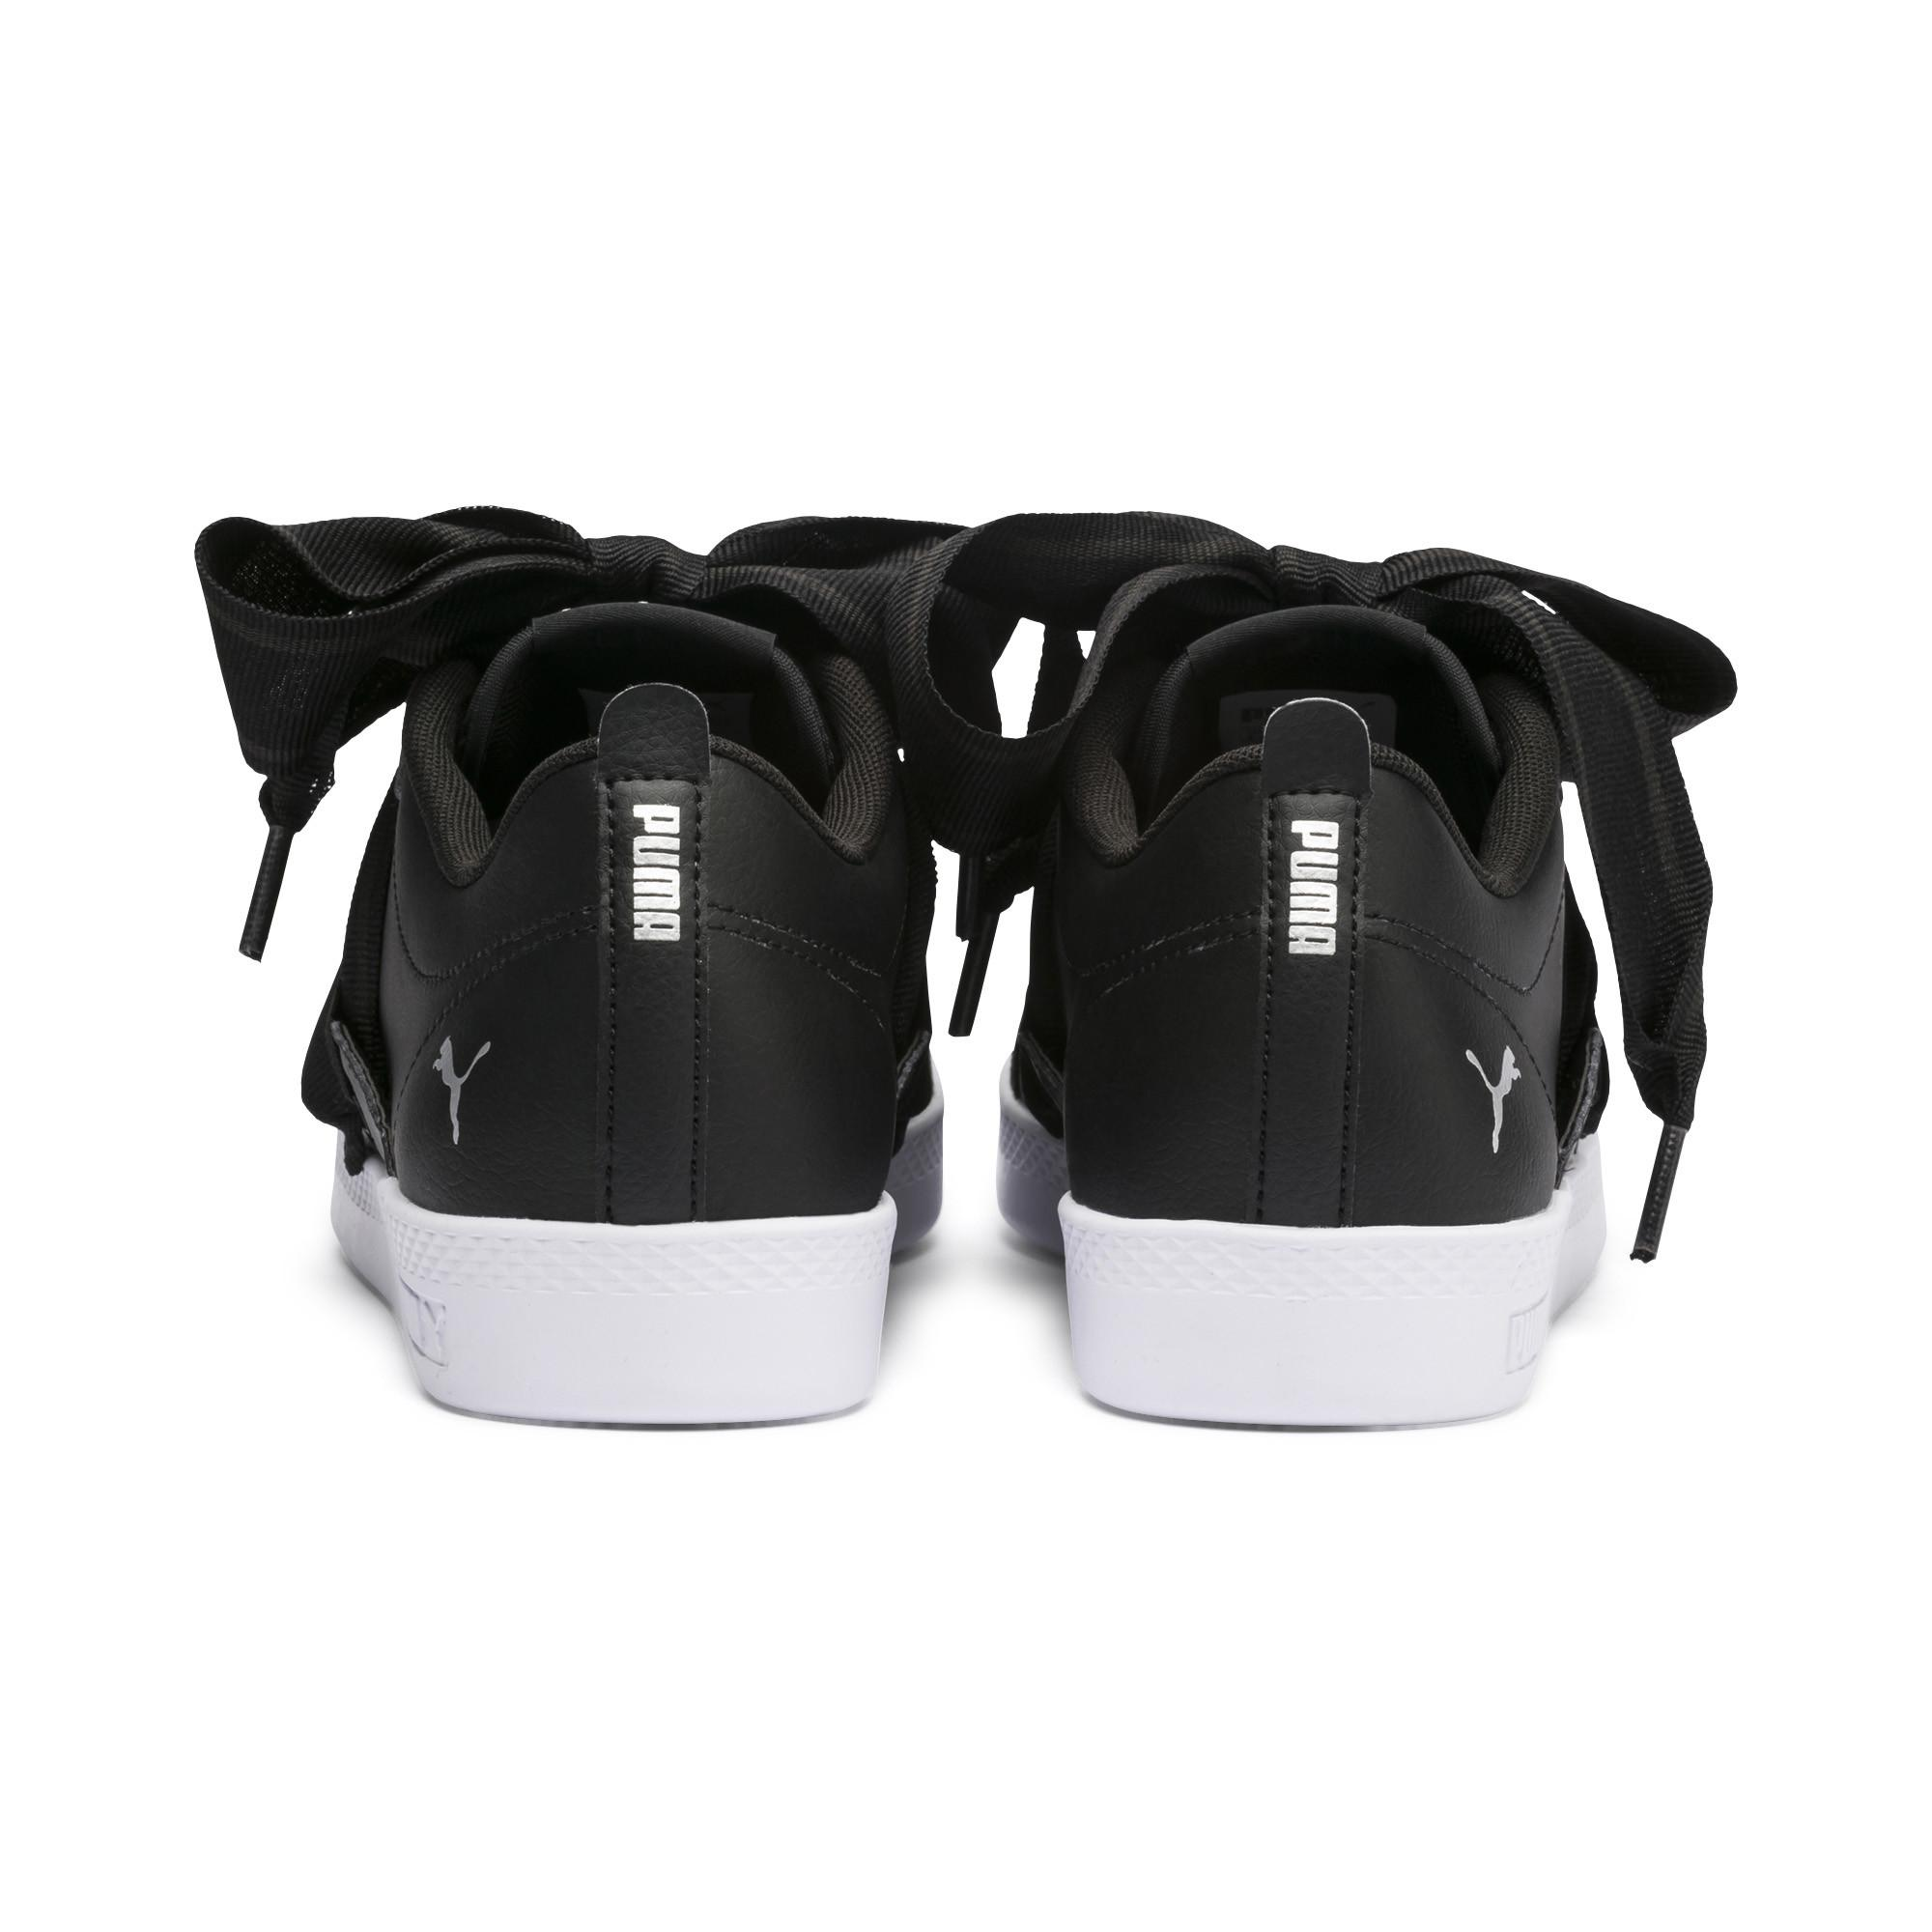 PUMA Smash Women's Buckle Sneakers in